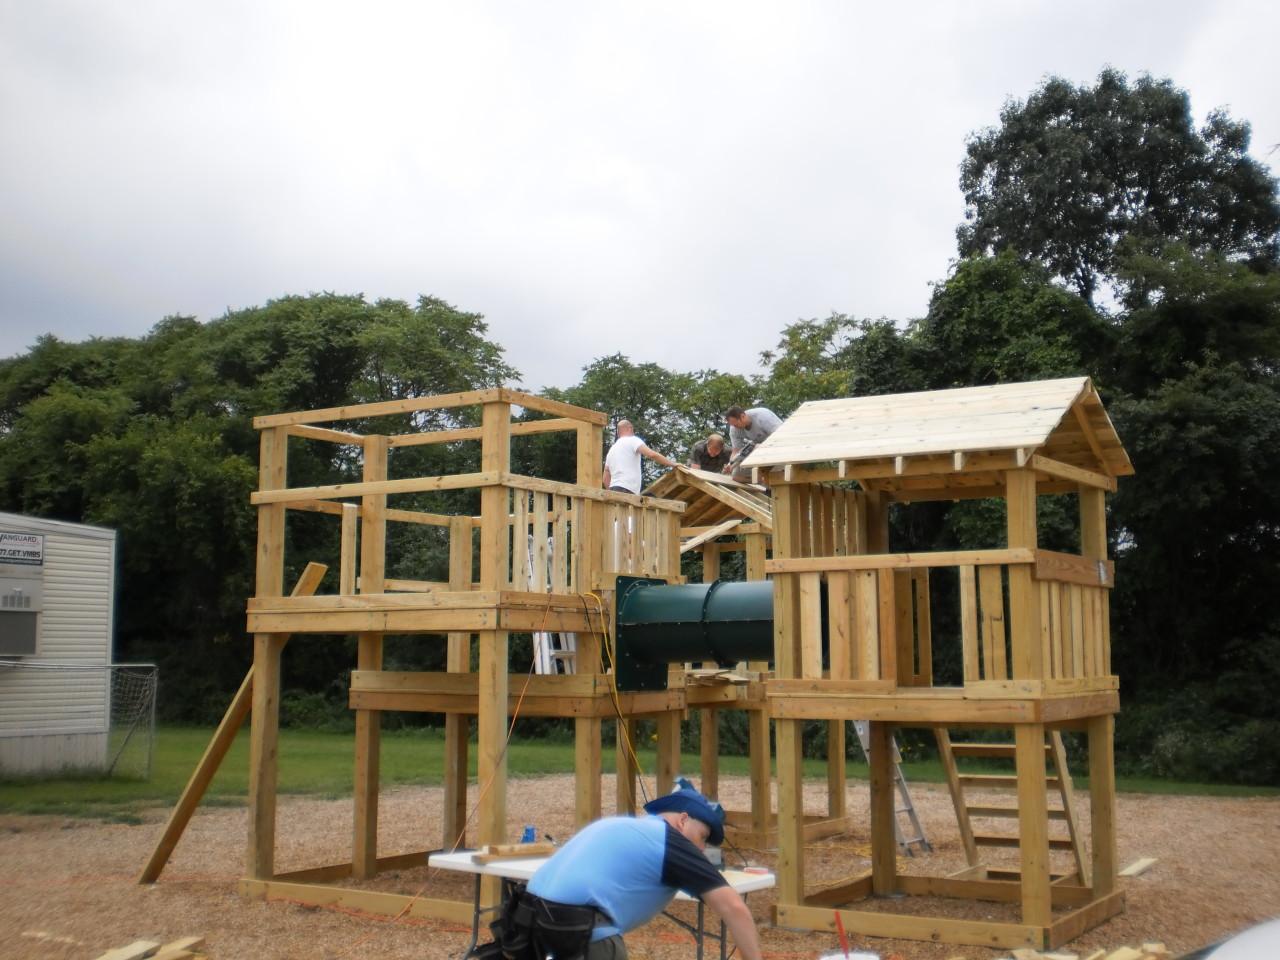 Building the playground